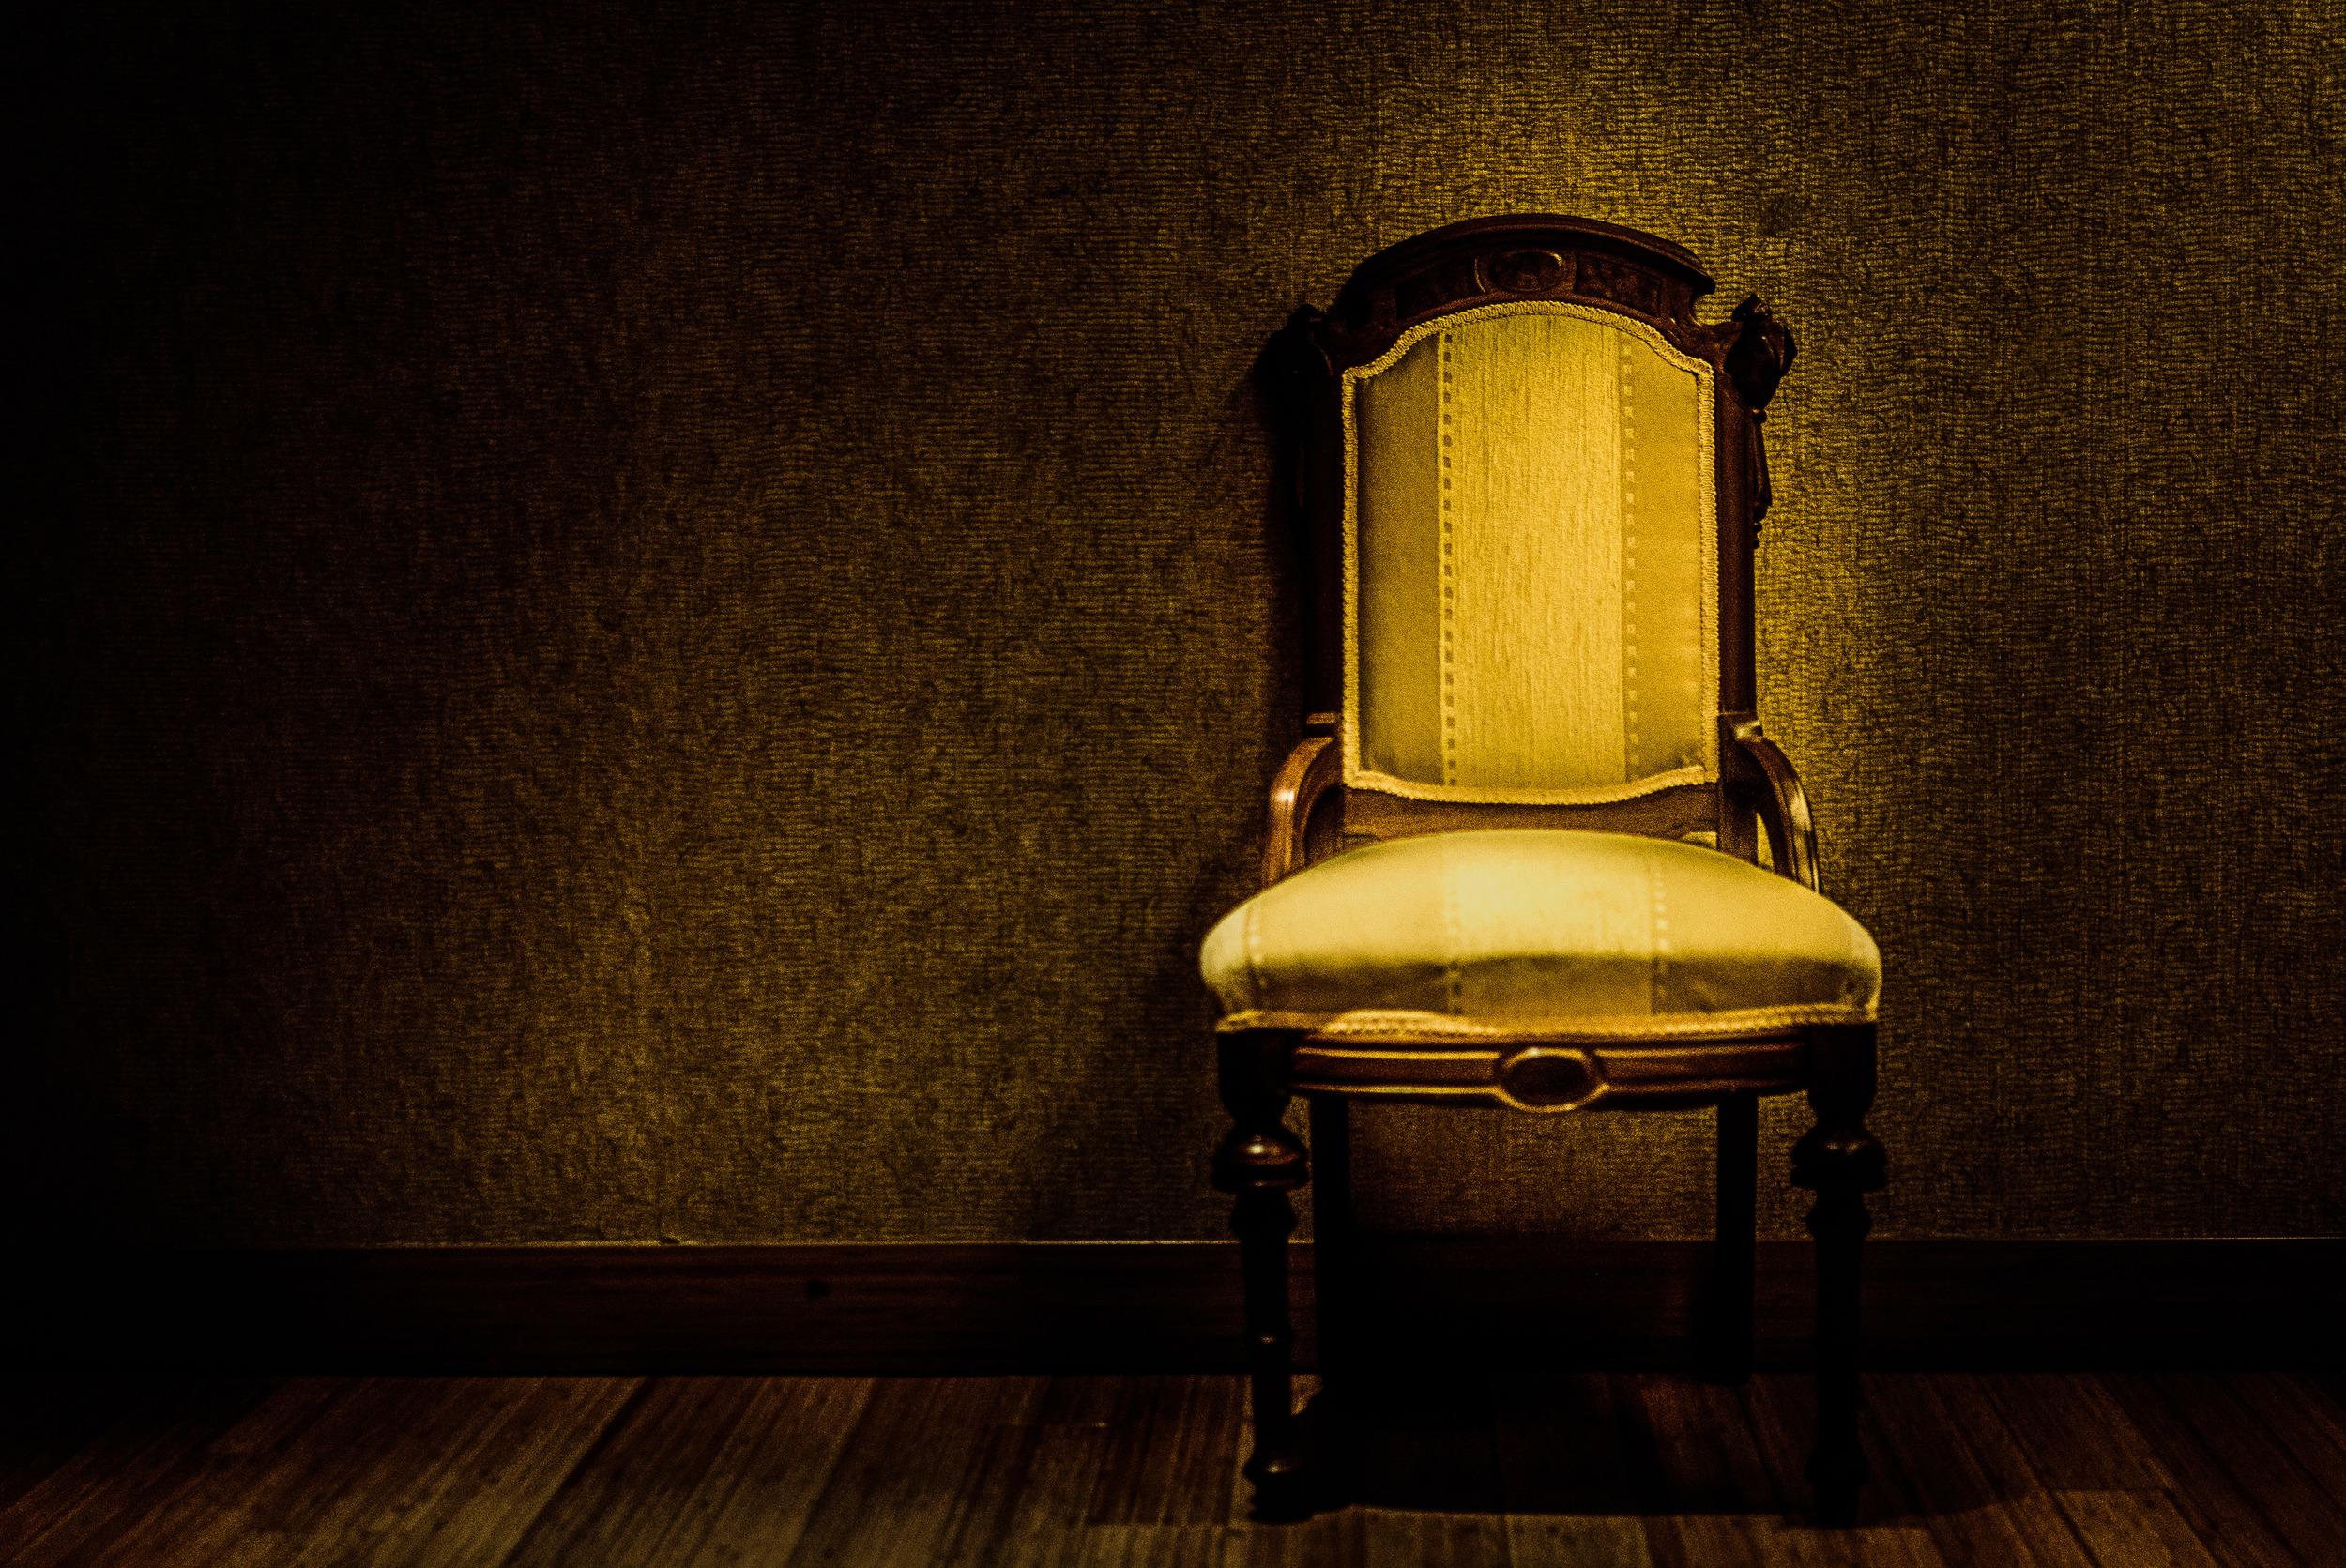 Brooding Chair